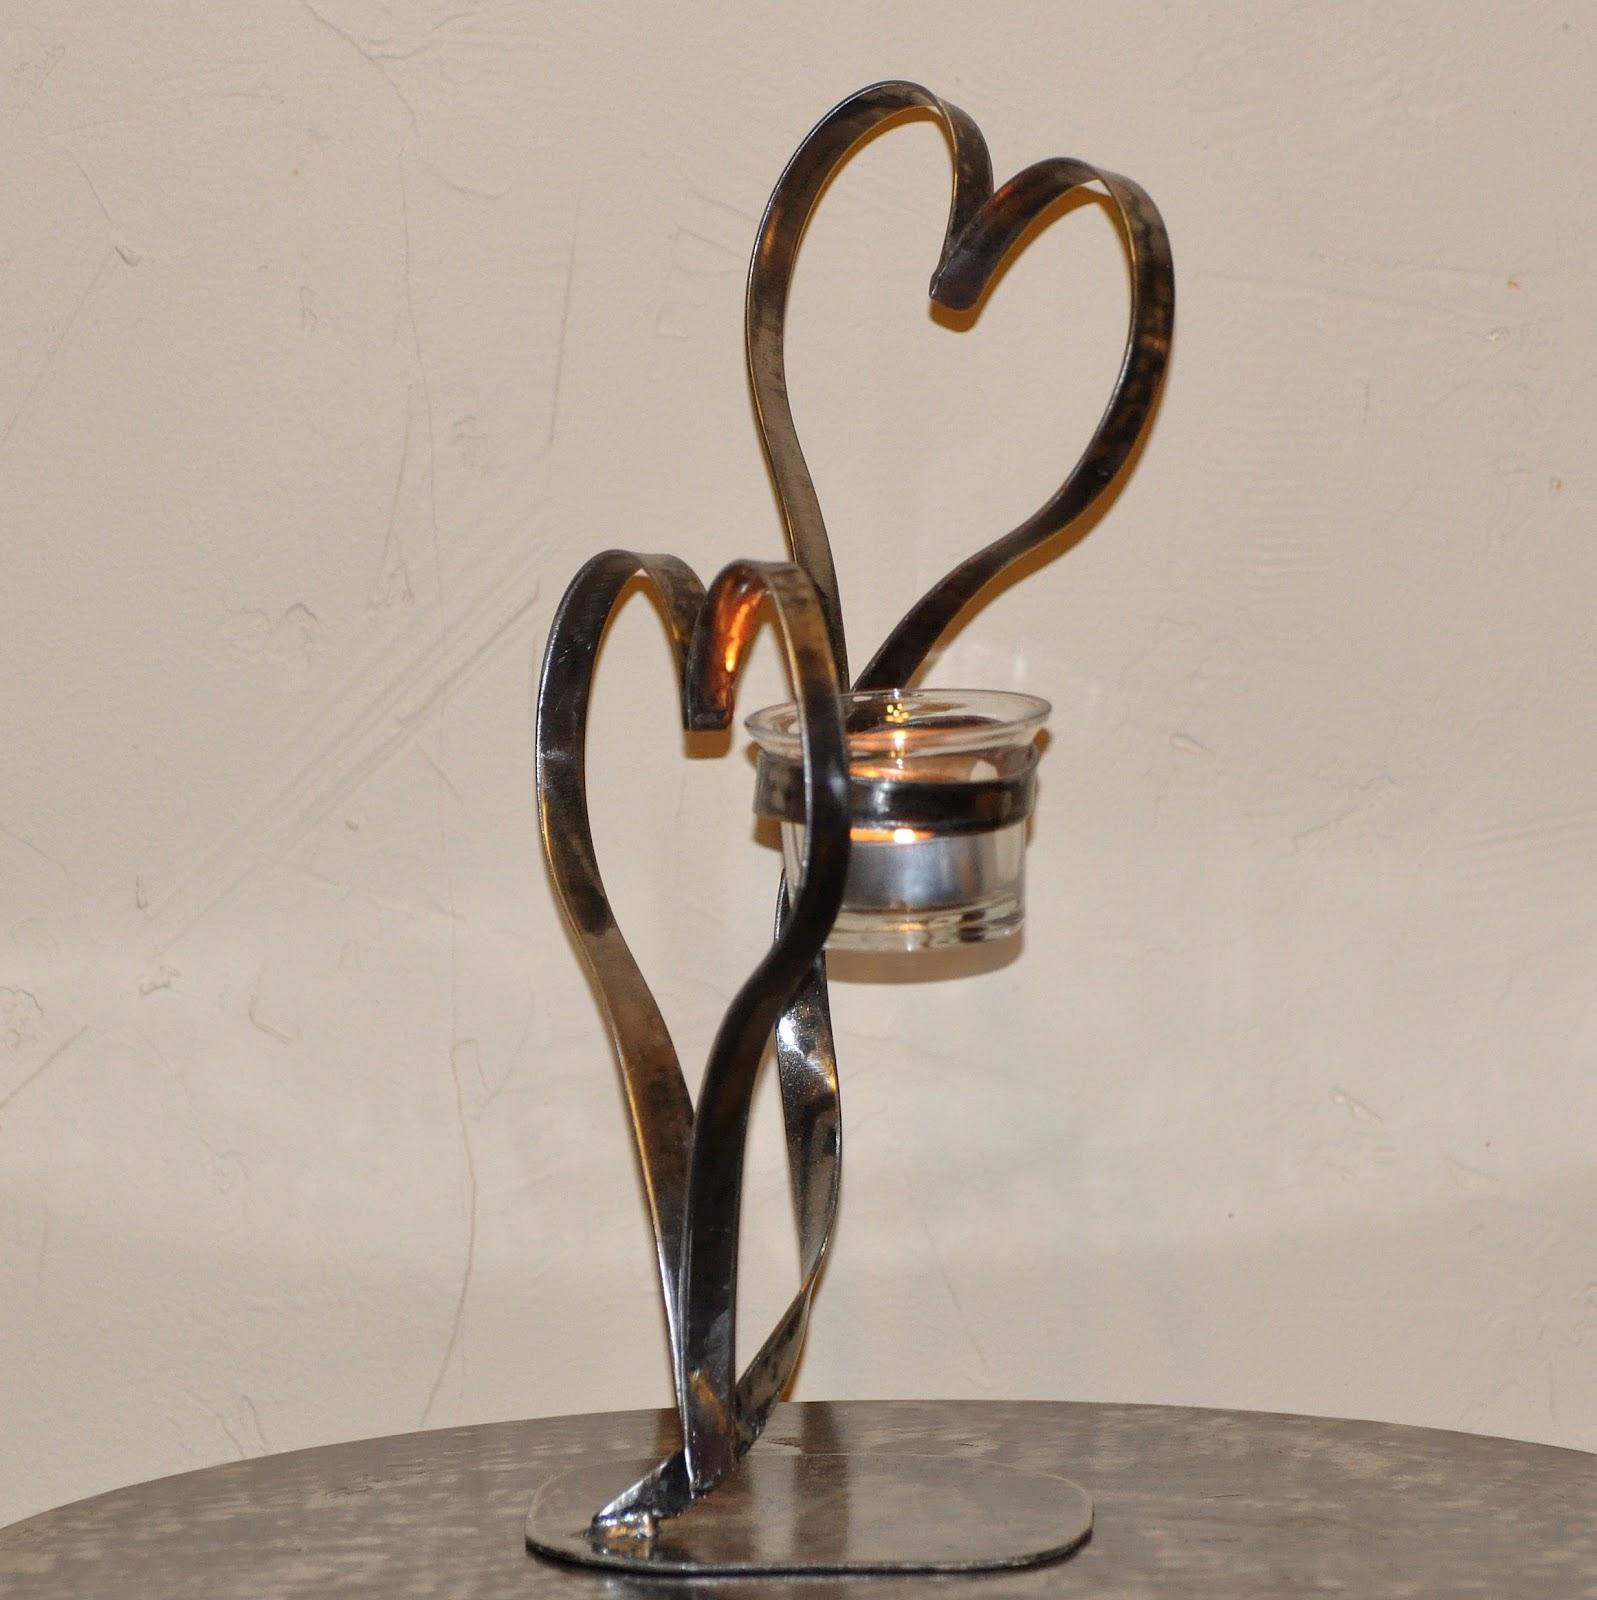 cr ateur d 39 objets d co en fer forg bougeoirs luminaires porte bouteille mai 2012. Black Bedroom Furniture Sets. Home Design Ideas